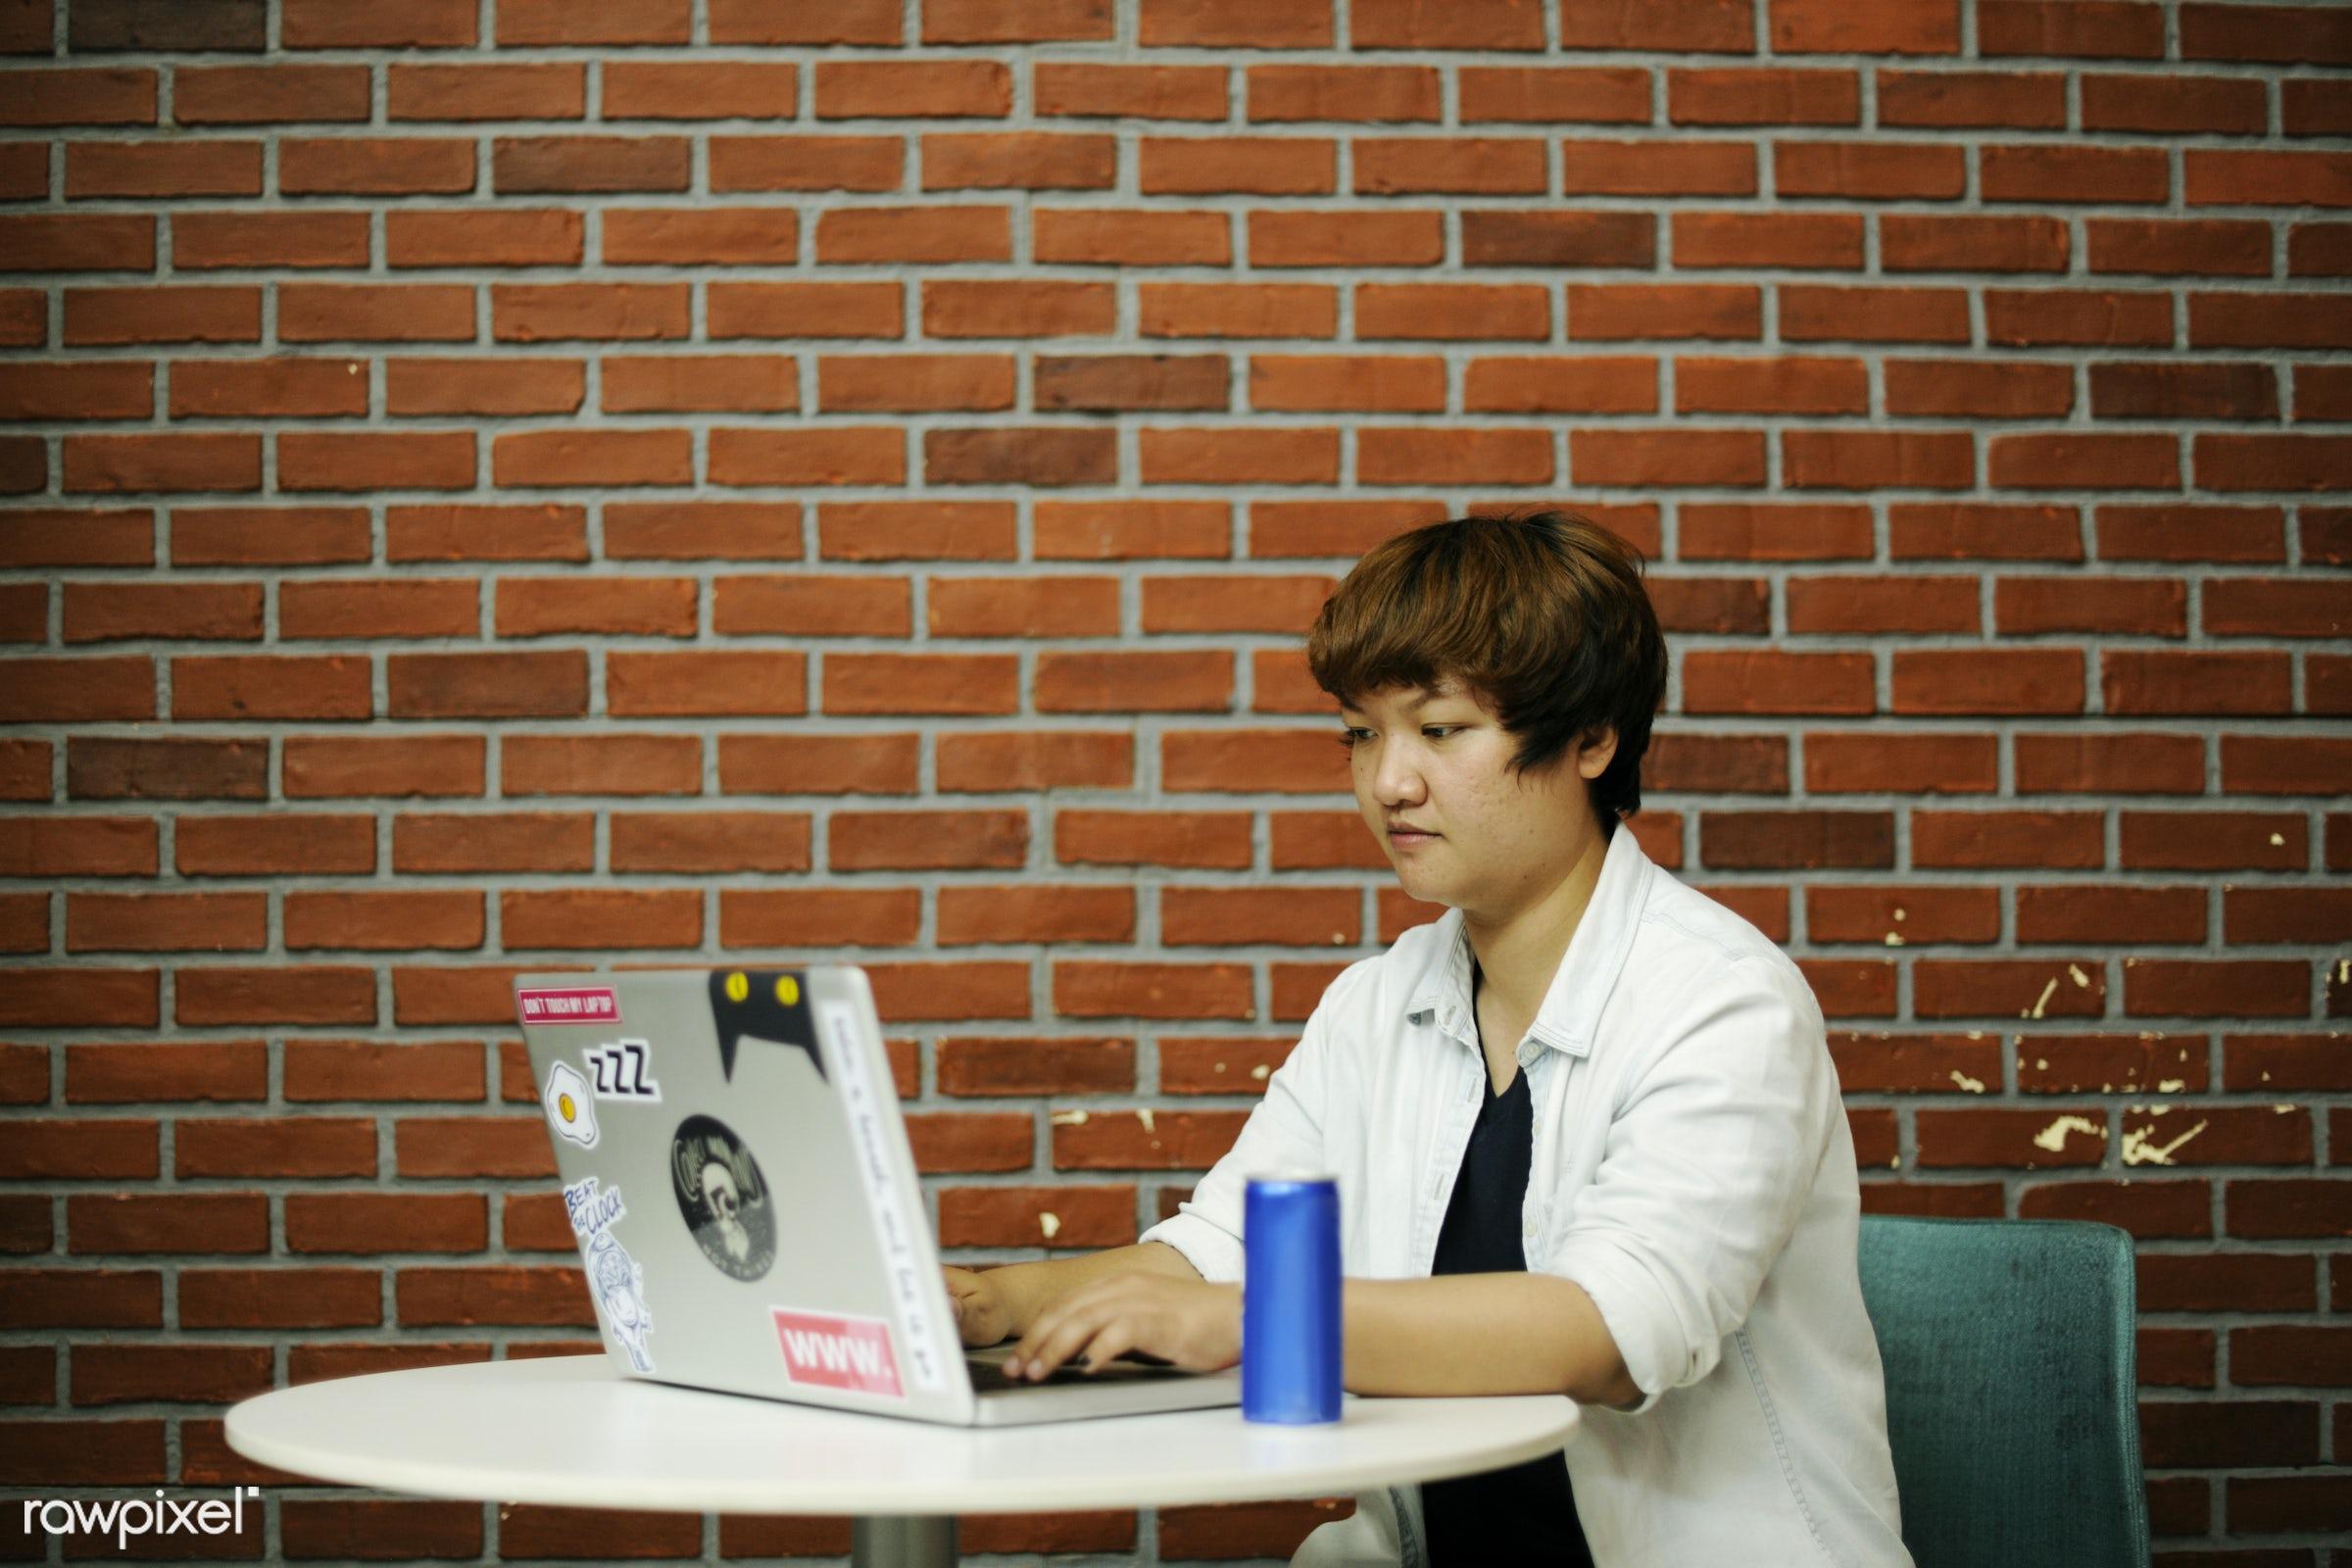 programmer, alone, asian, brick wall, casual, communication, device, digital, job, laptop, new business, notebook, one,...